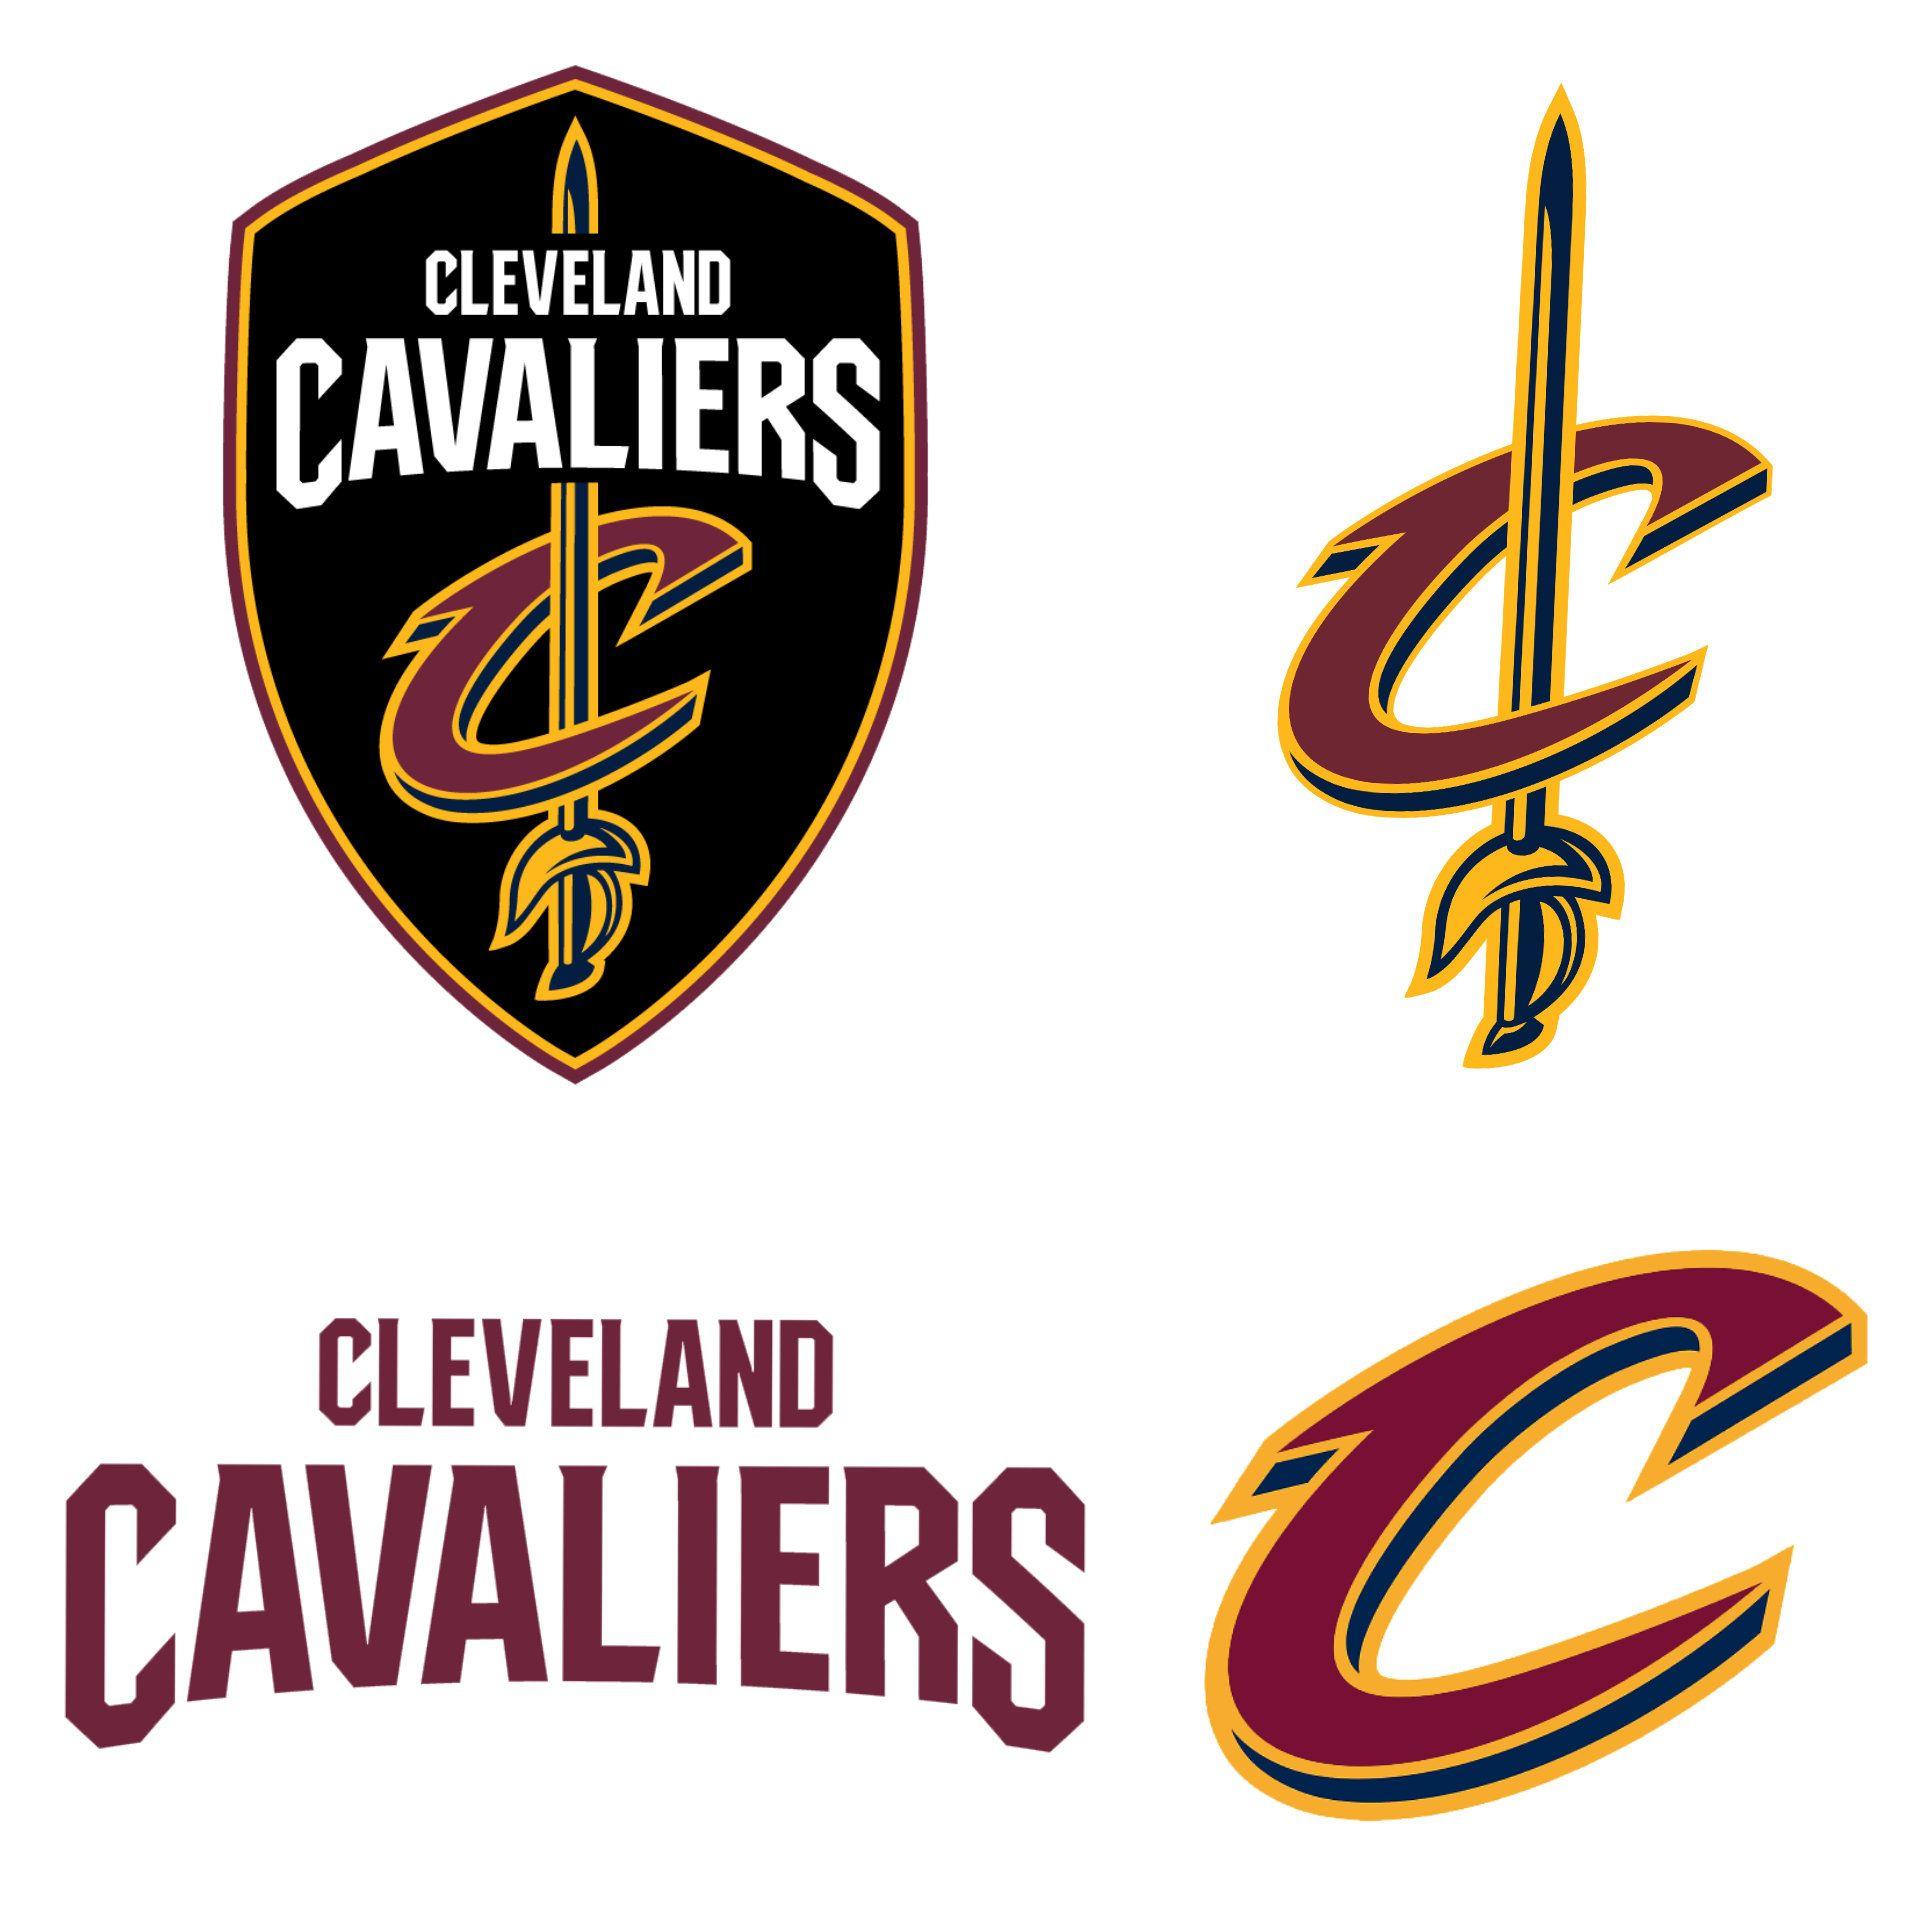 Cleveland Cavaliers Svg Cavaliers Svg Ai Eps Dxf Etsy Cleveland Logo New York Giants Logo Svg